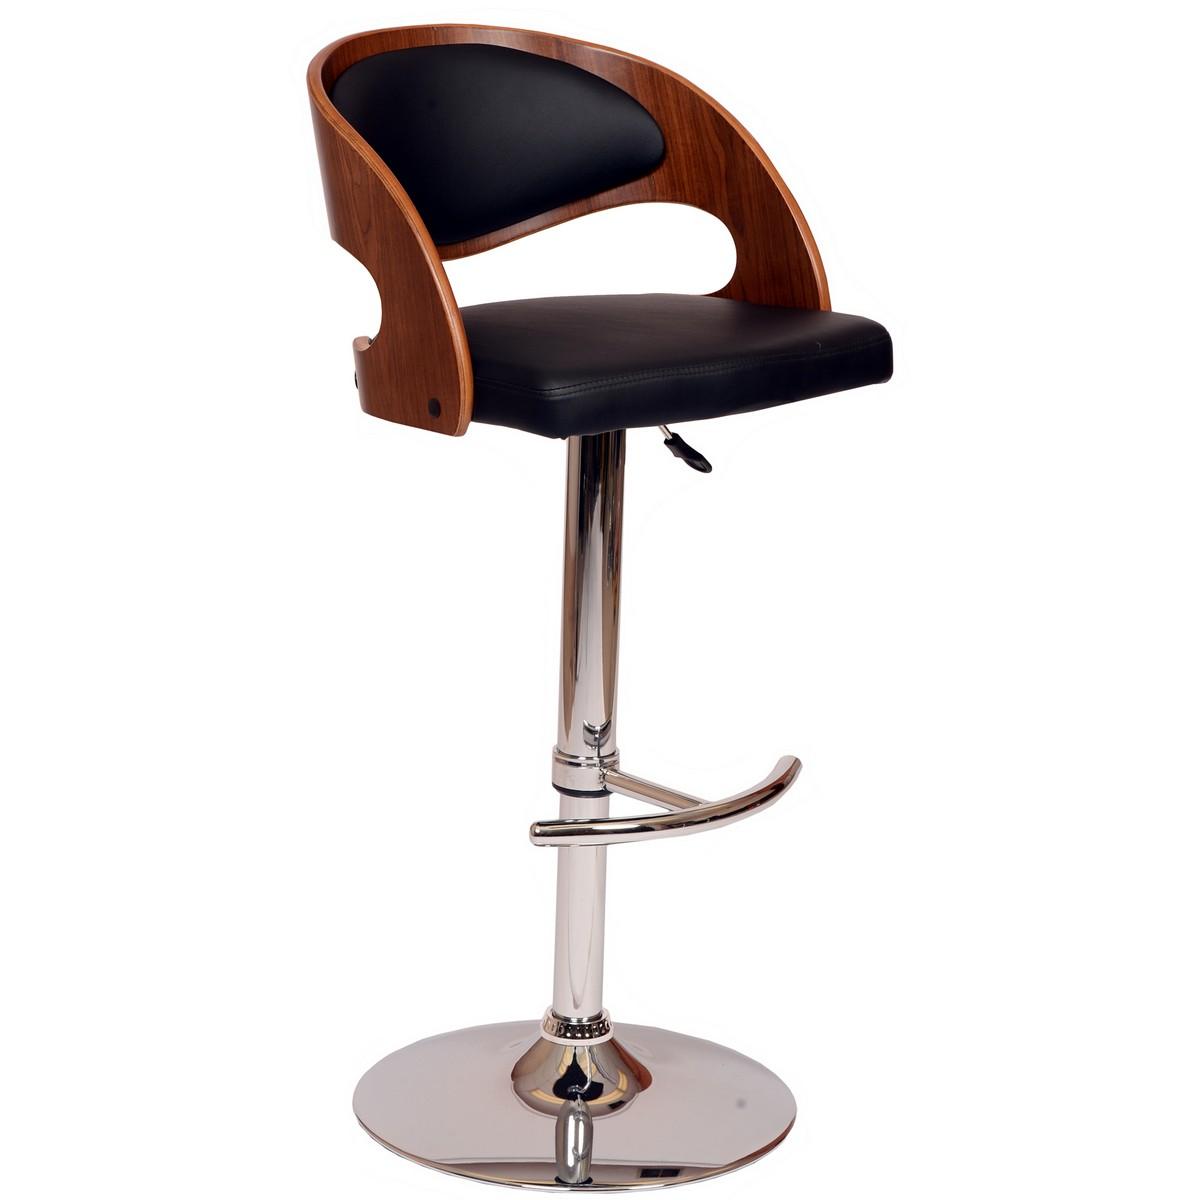 Armen Living Malibu Swivel Barstool In Black Leatherette/ Walnut Veneer and Chrome Base